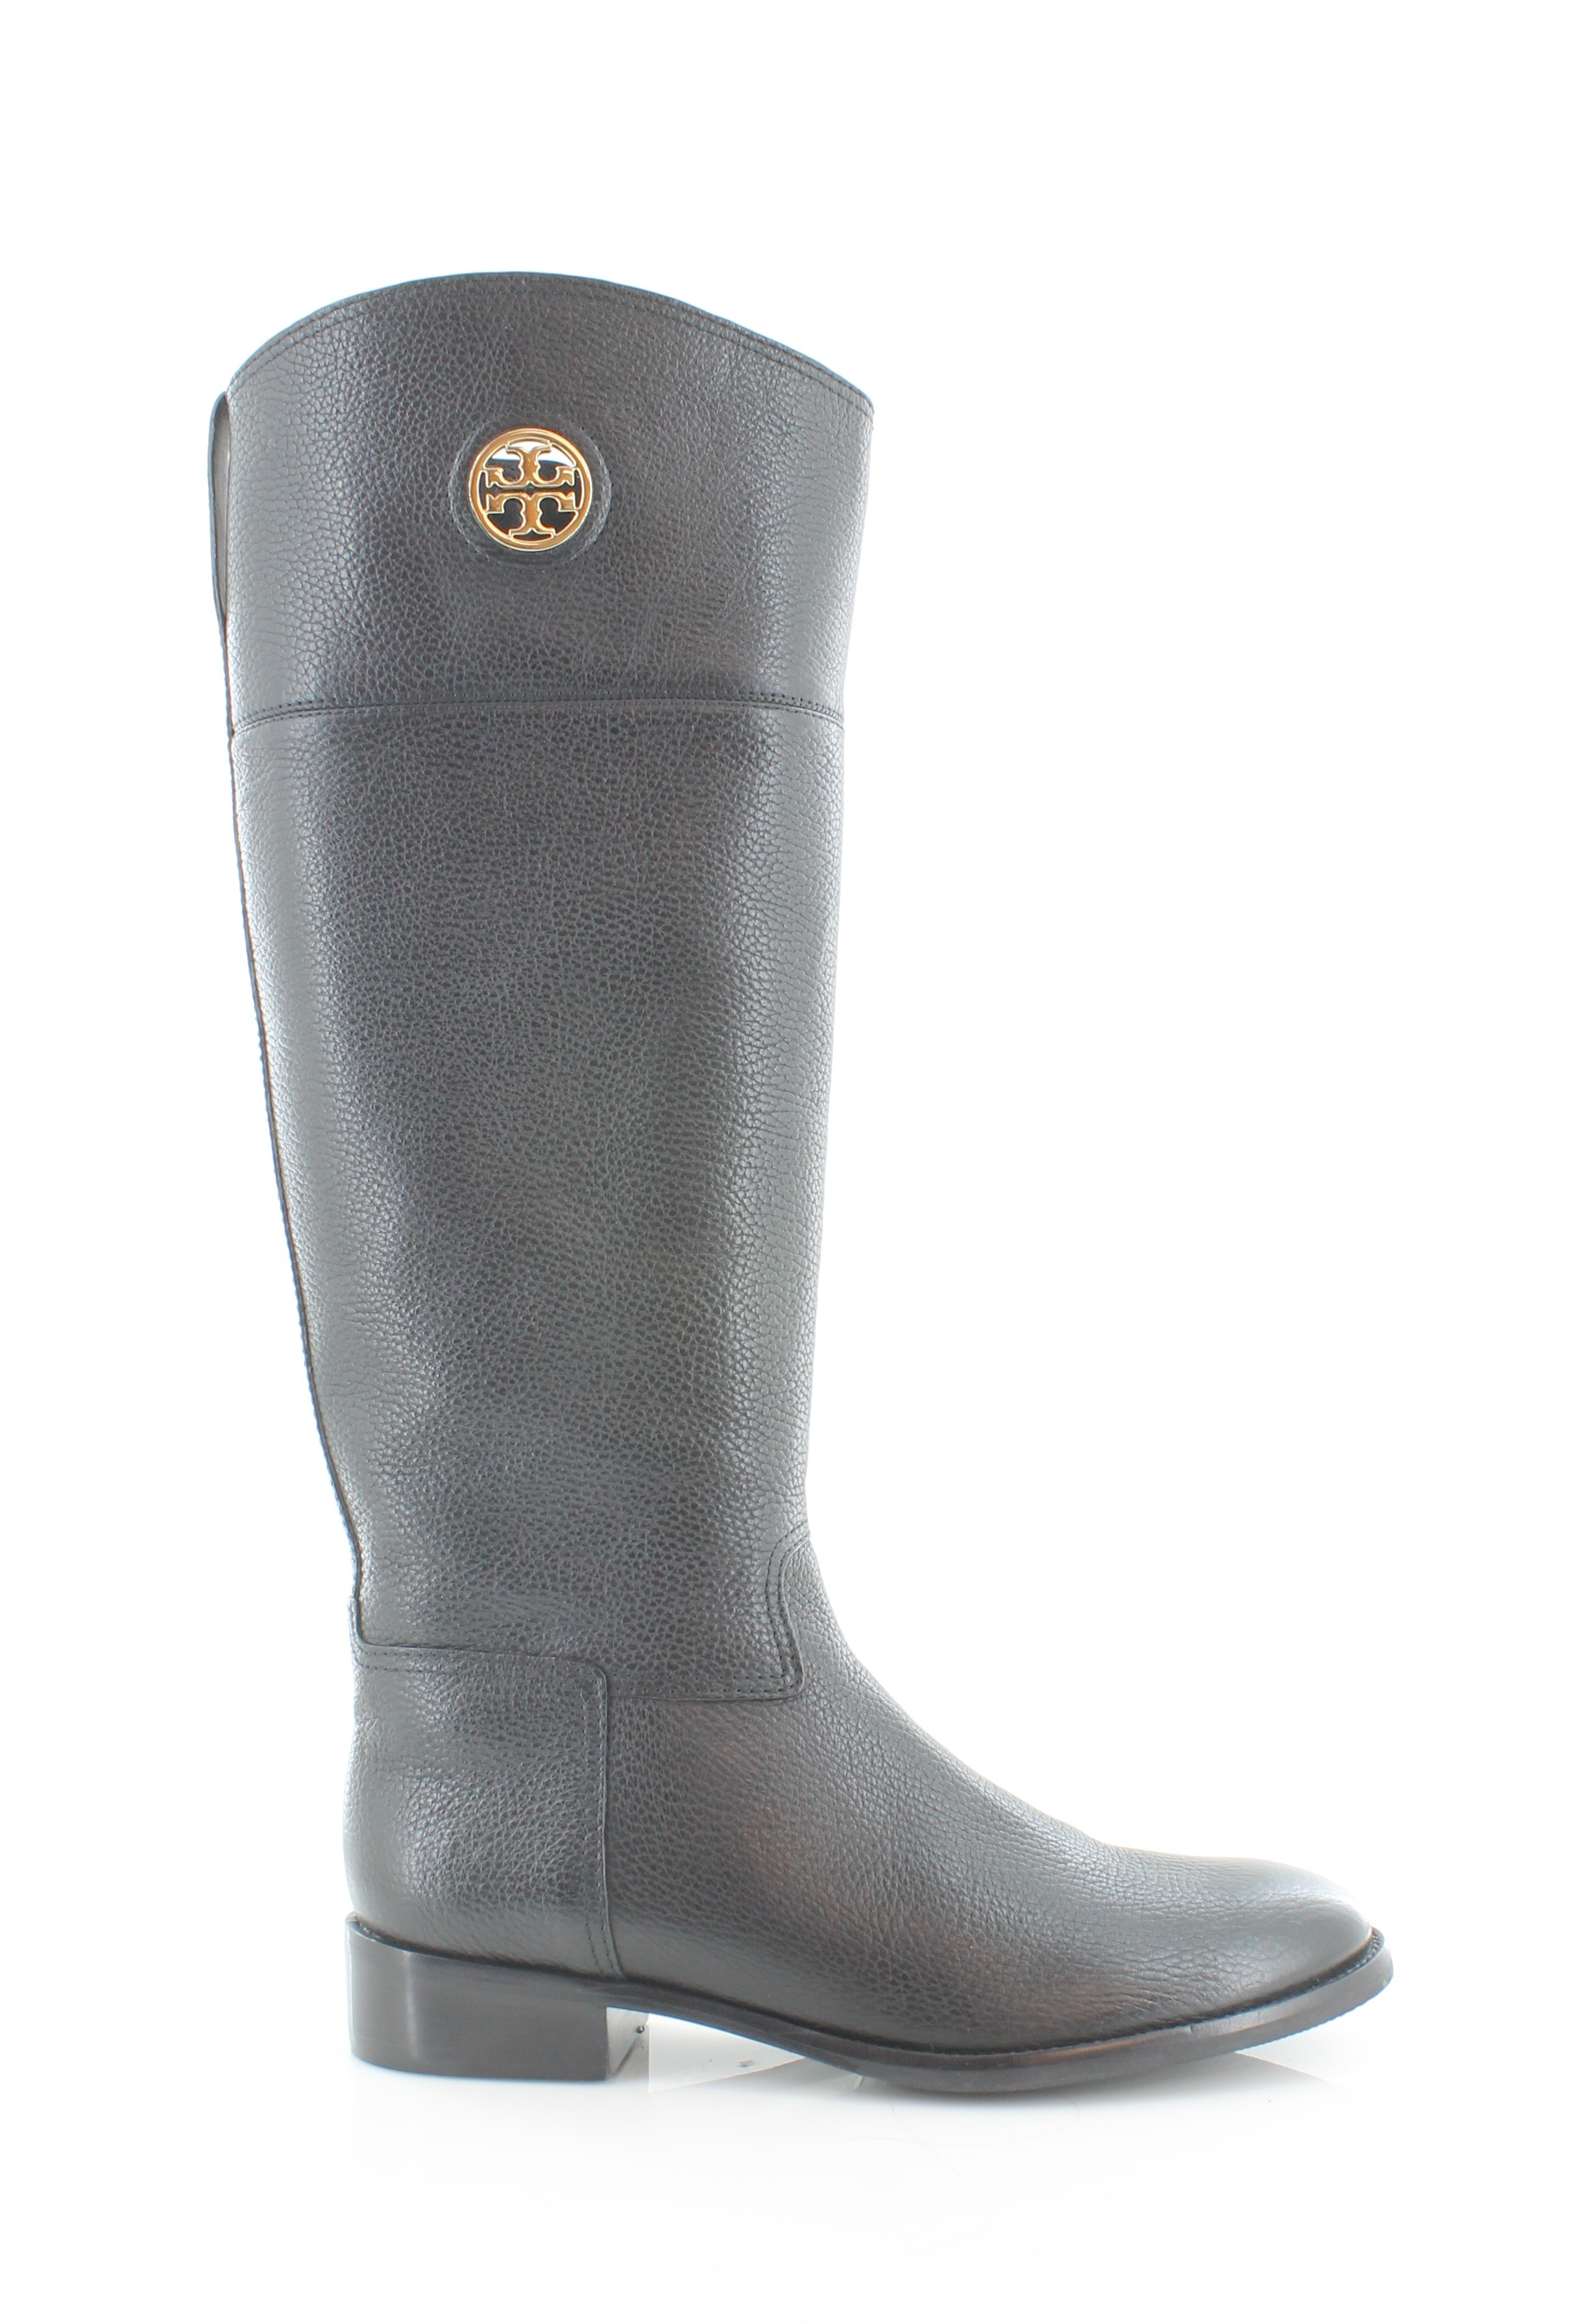 77b6f6764 Tory Burch - Tory Burch Junction Riding Boot Women s Boots - Walmart.com